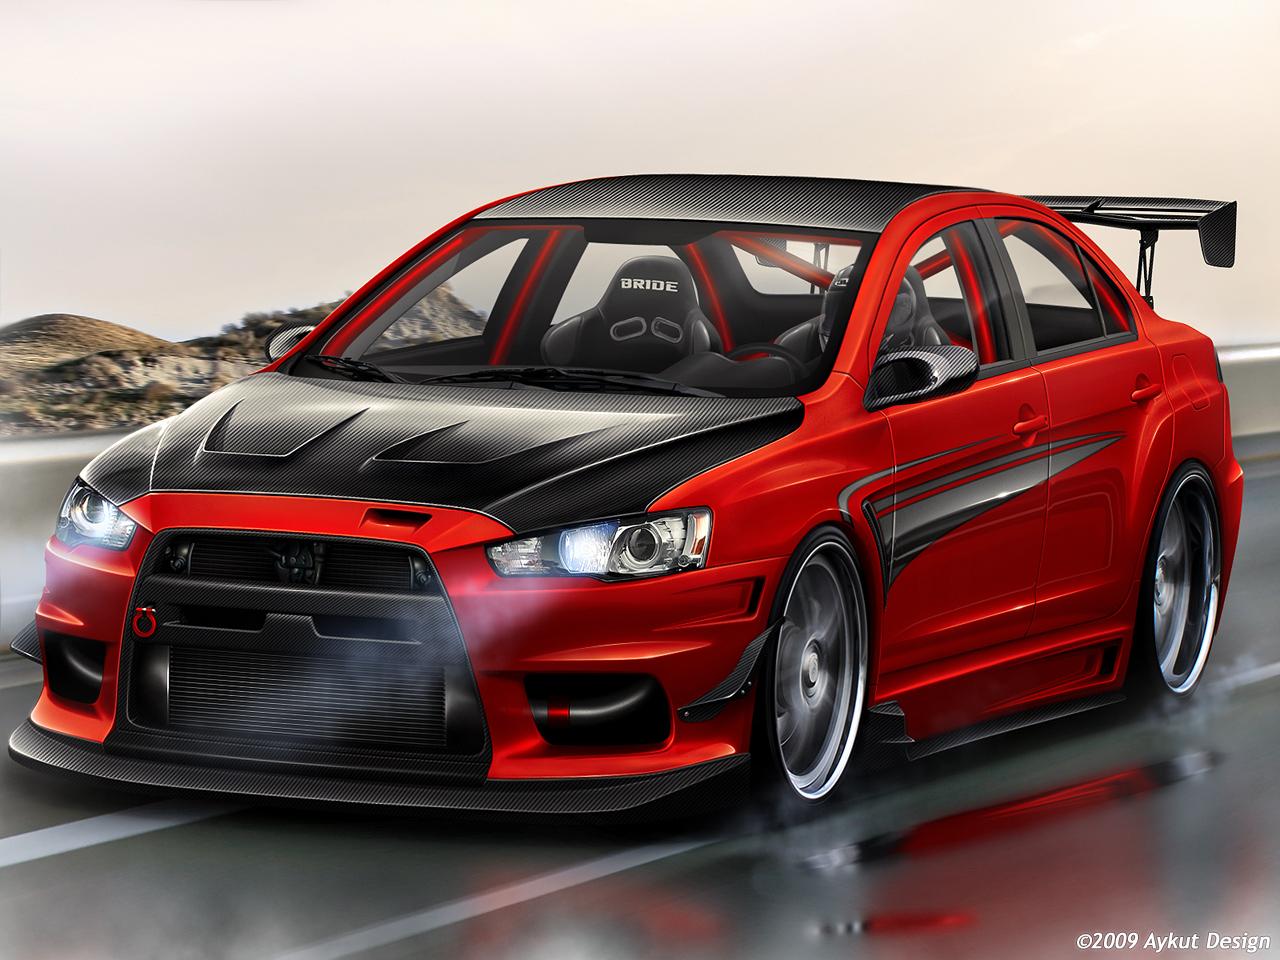 modified cars mitsubishi evo x custom body kit - Mitsubishi Lancer Evolution Custom